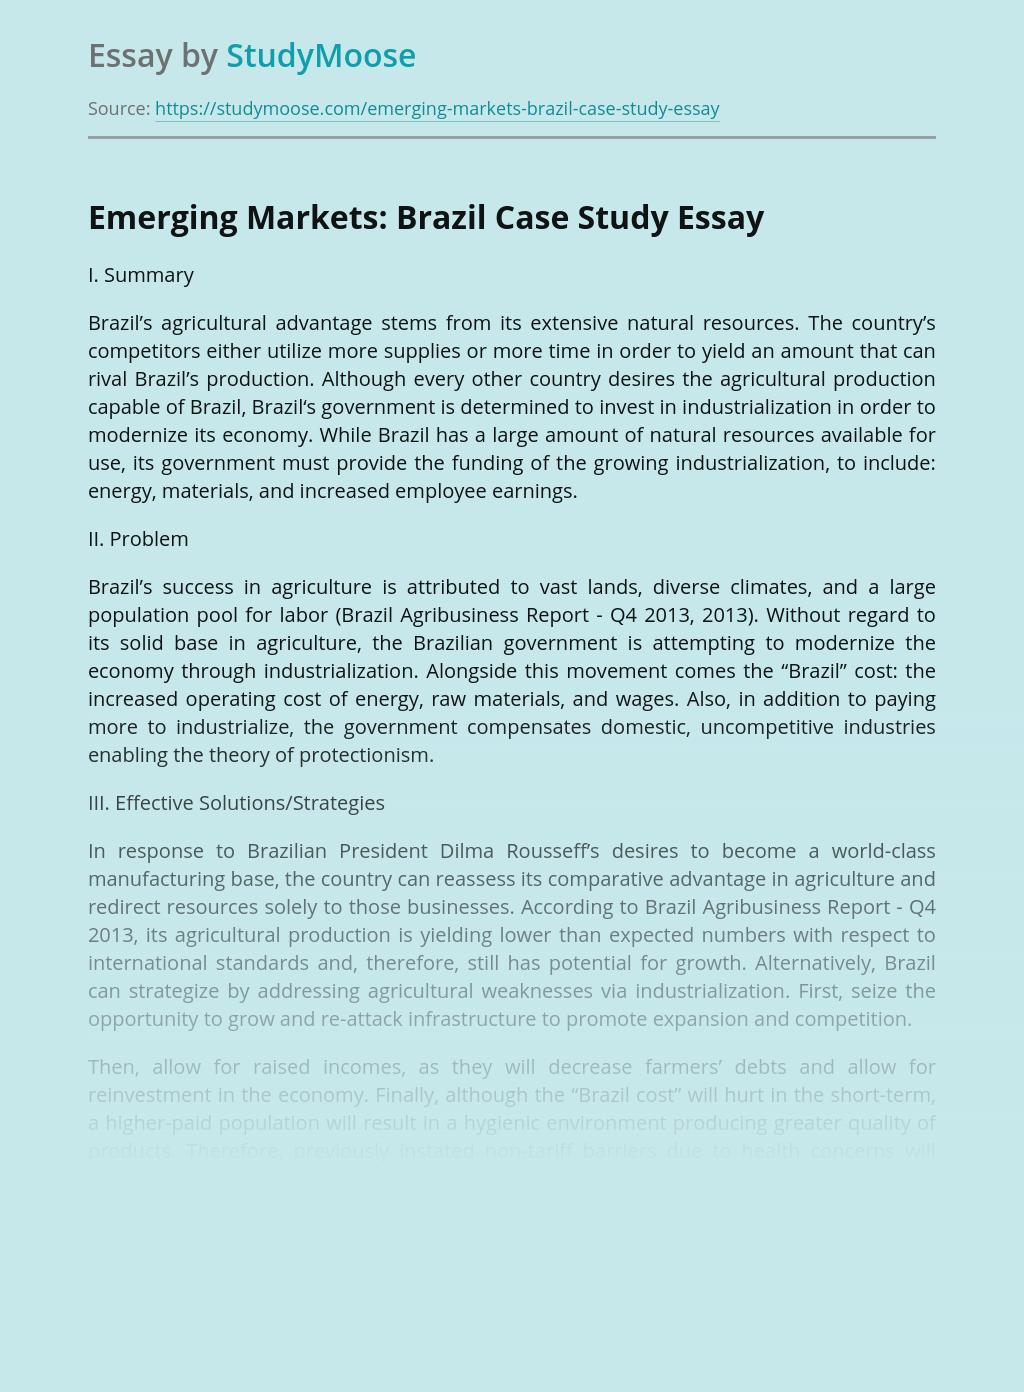 Emerging Markets: Brazil Case Study